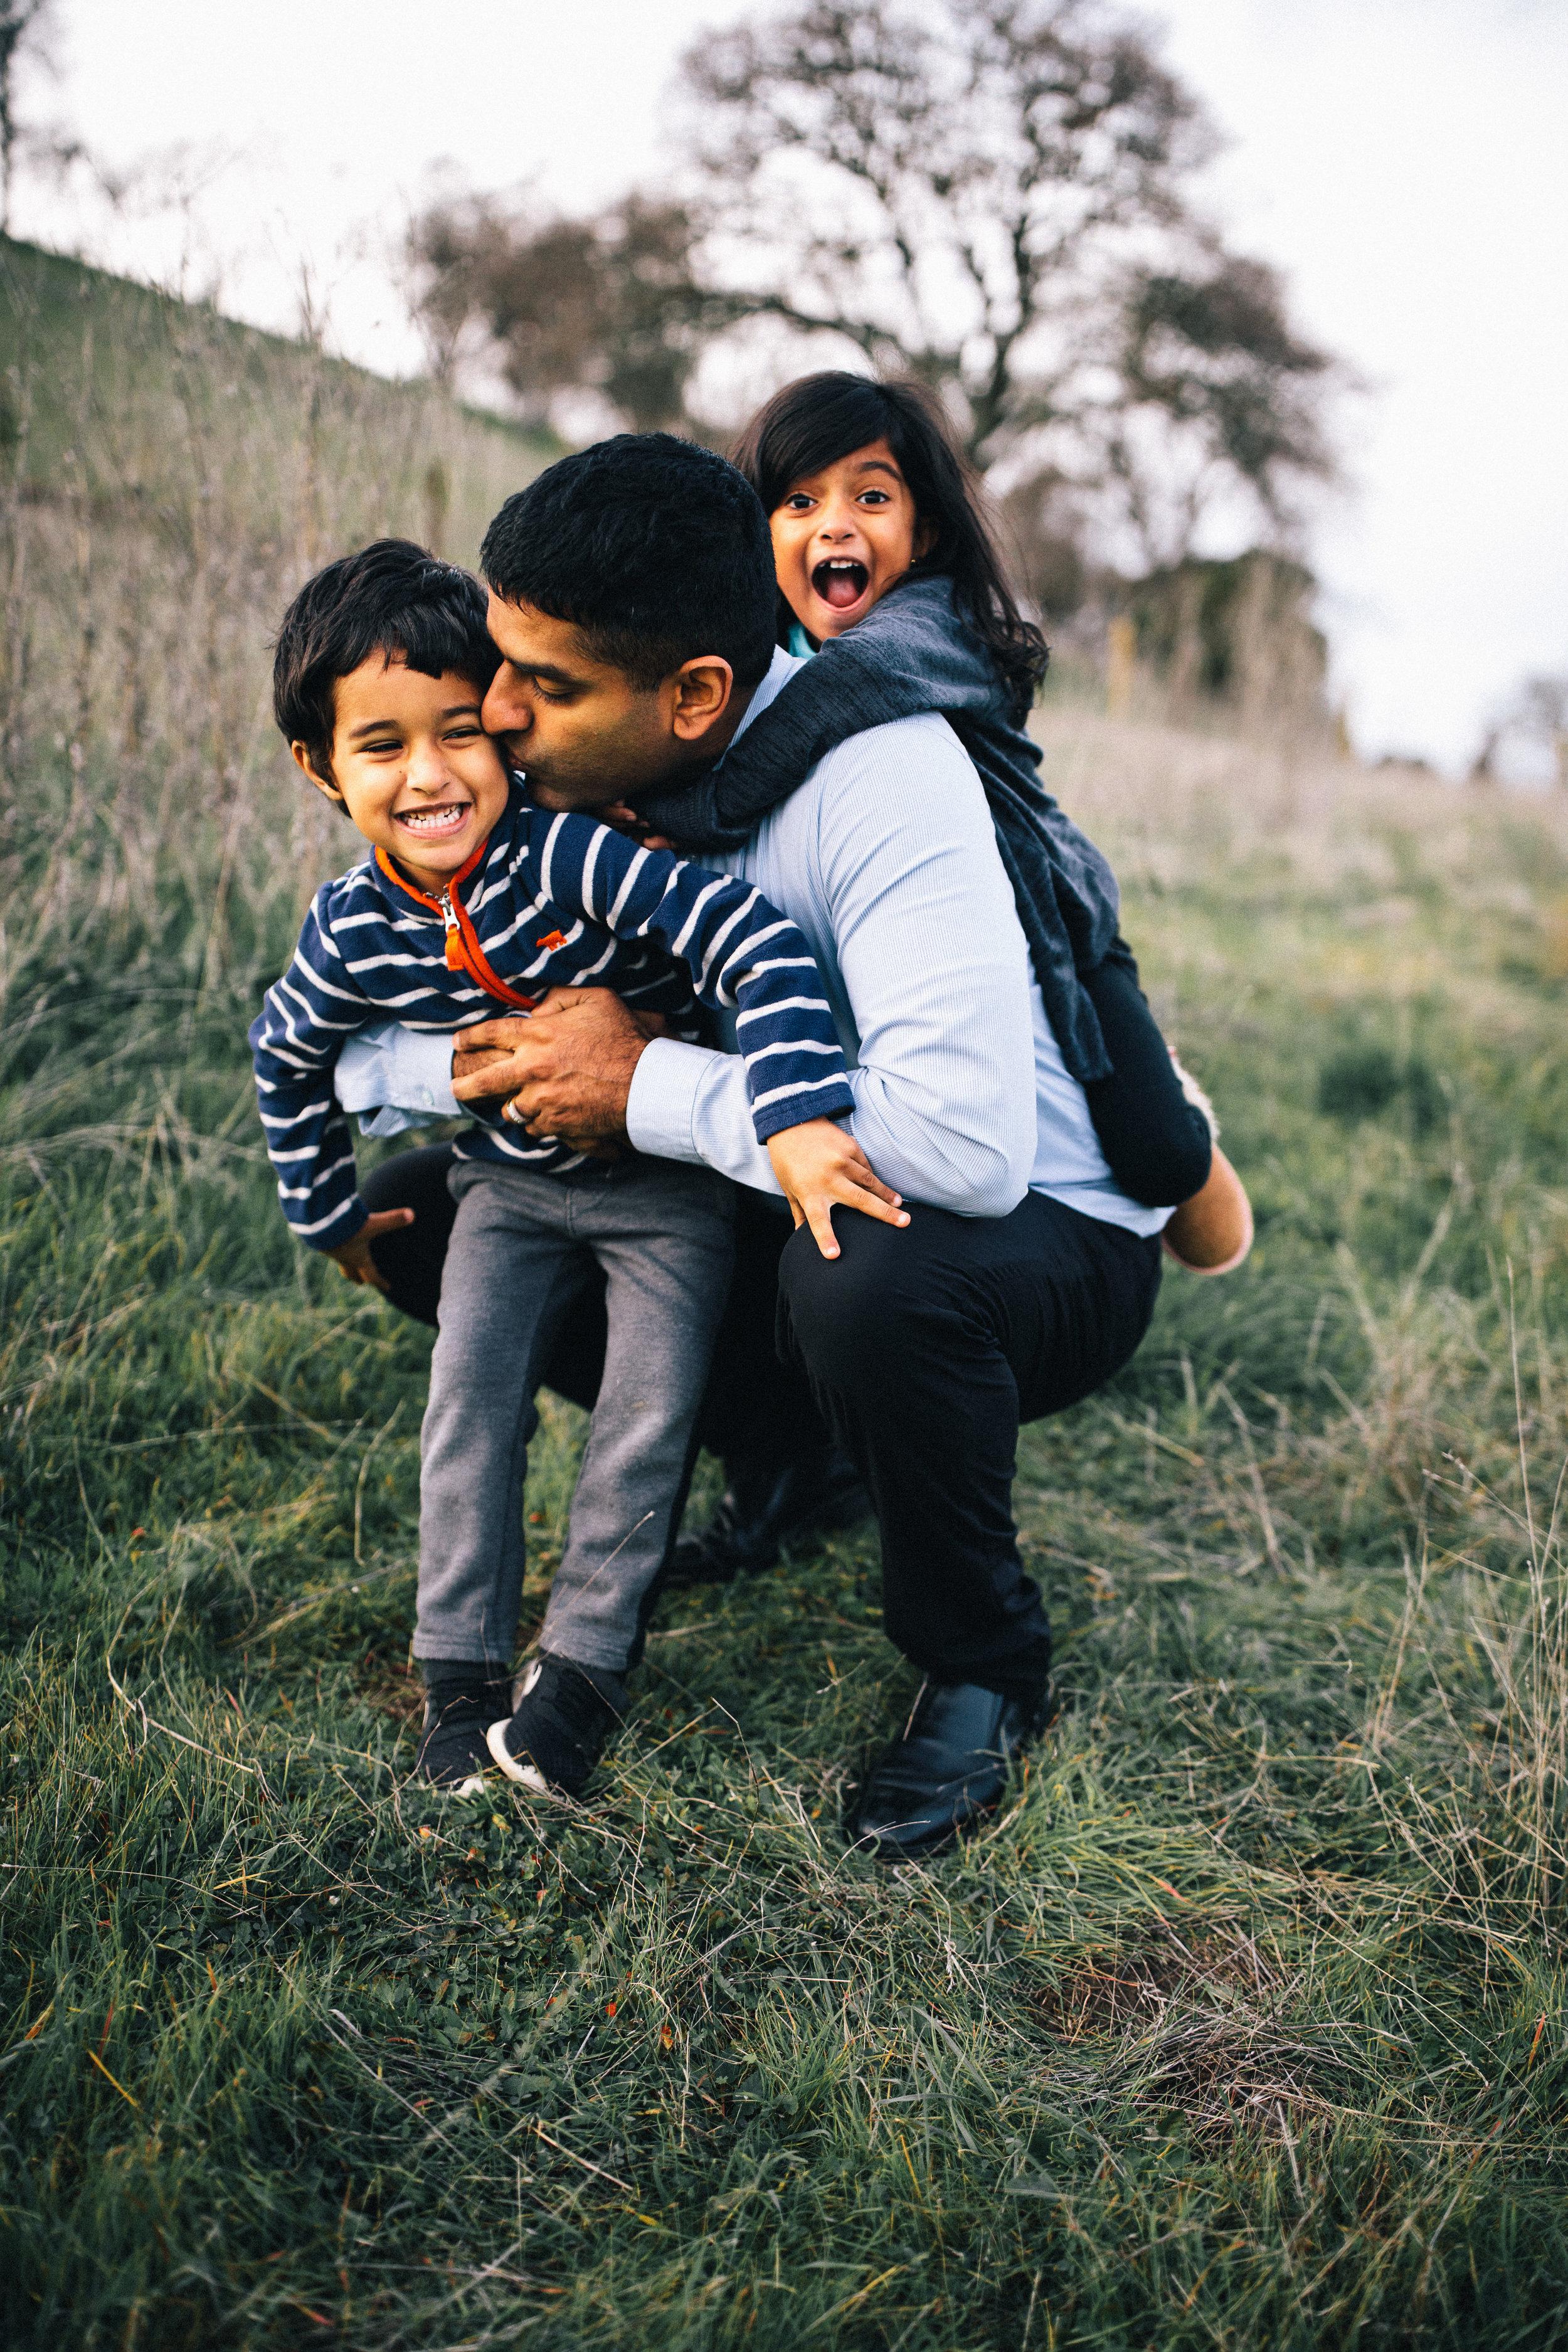 2018_01_01 Ahmad Family Session Blog Photos Edited Full Resolution 0033.jpg